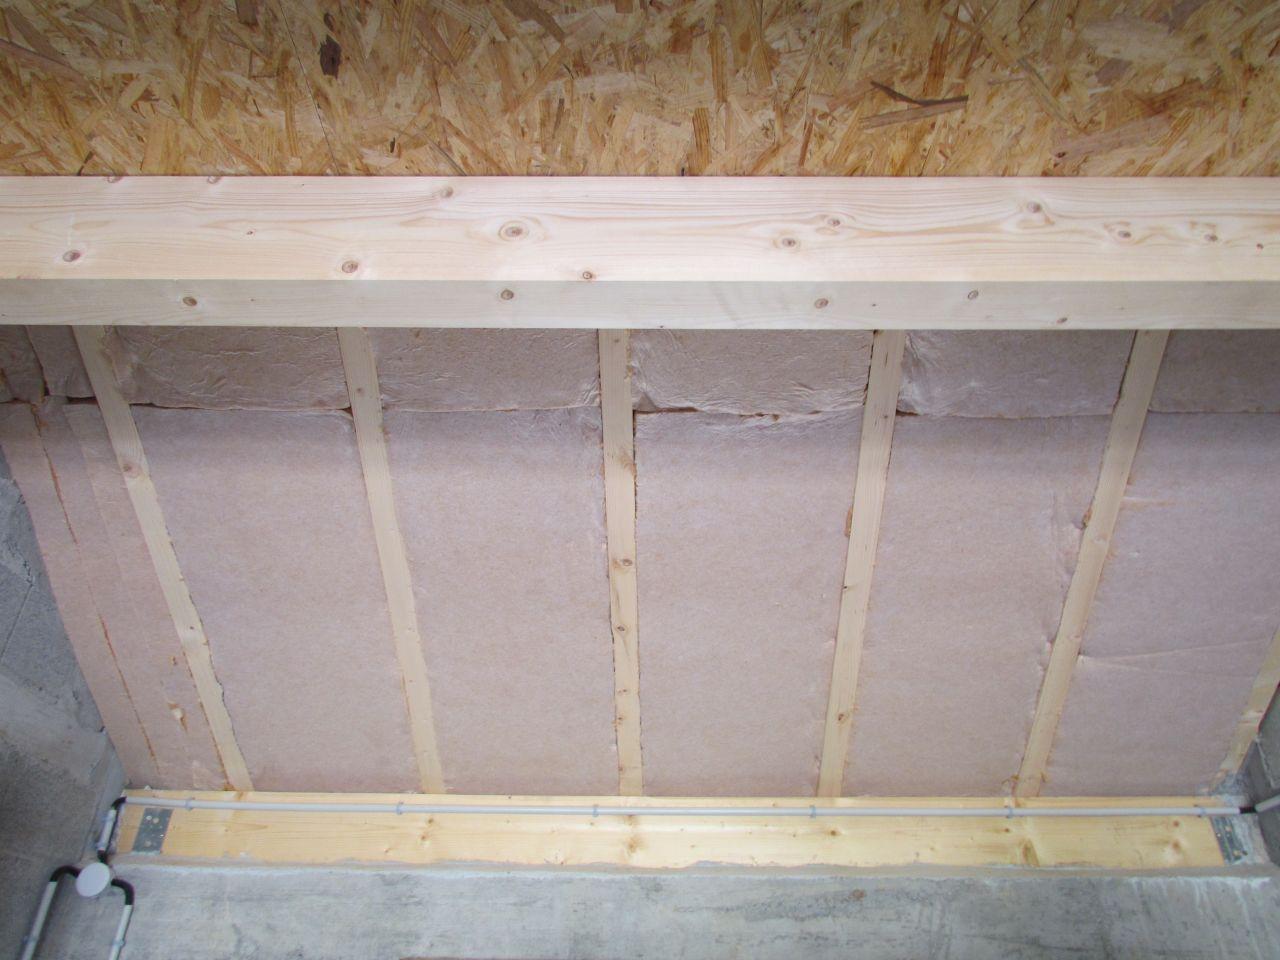 Am nagement du garage atelier fa ence et plomberie for Isoler toit garage